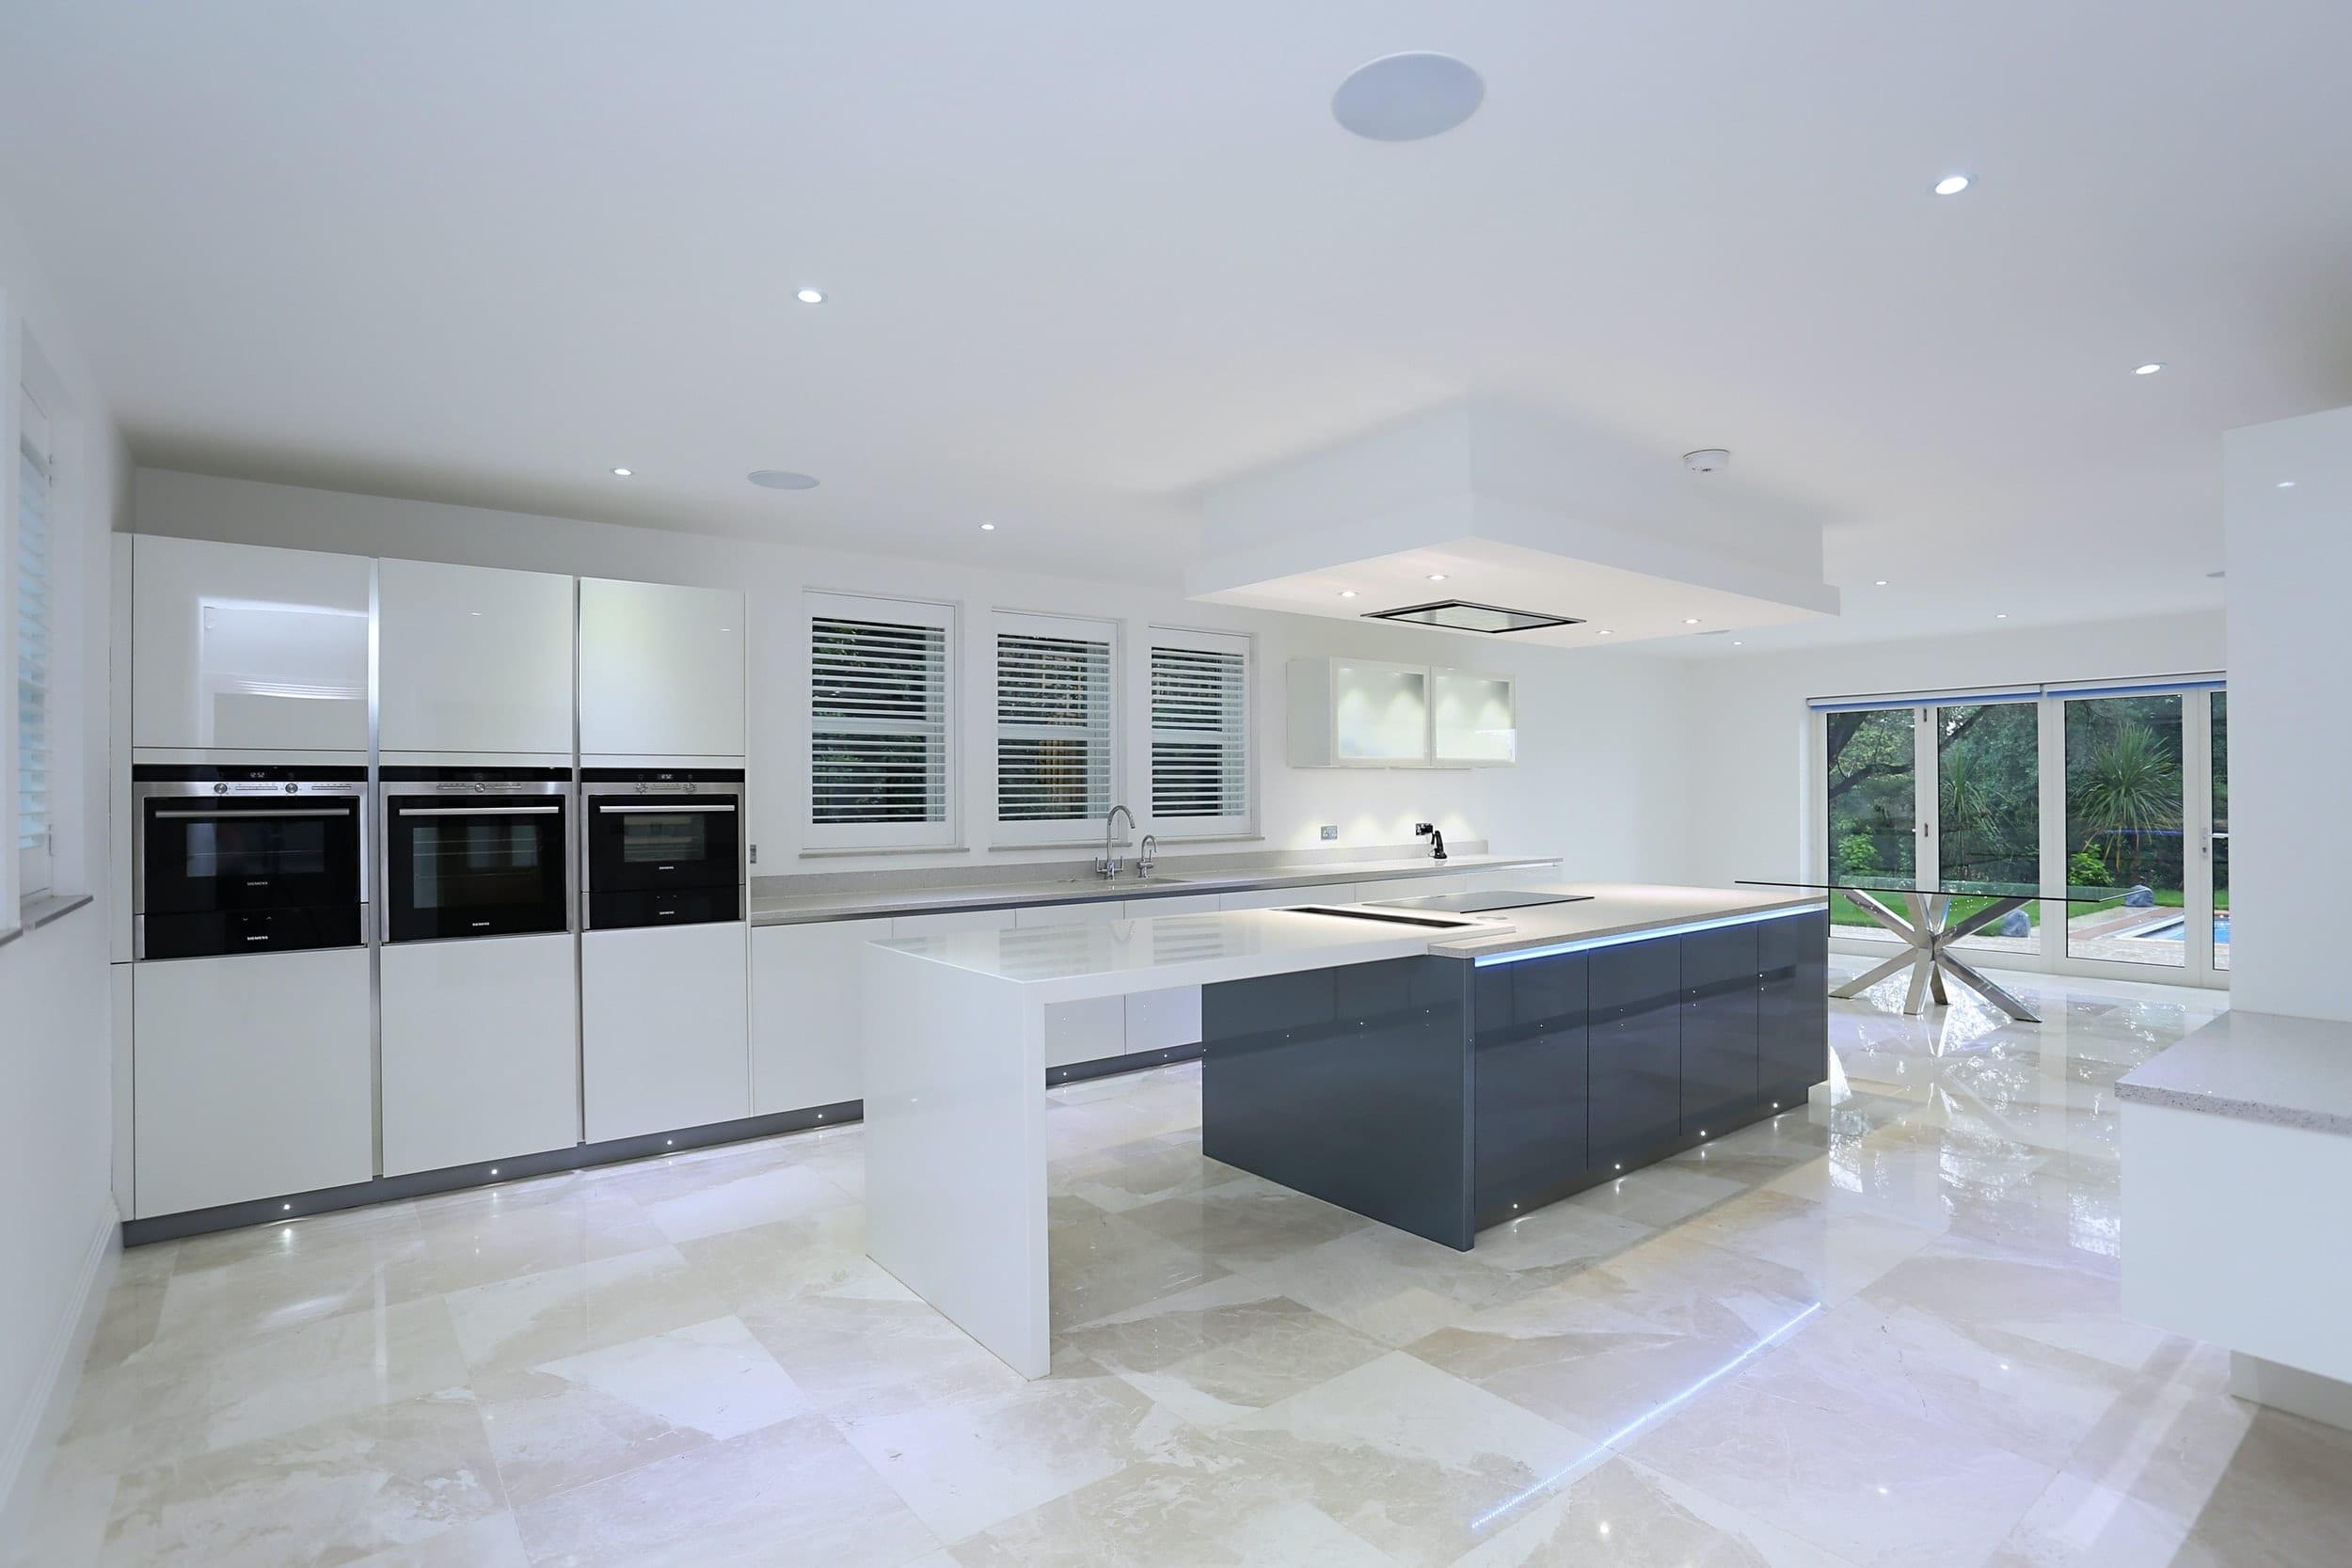 1. Handleless glass kitchen design 1 - Hadley Kitchens, Leamington Spa